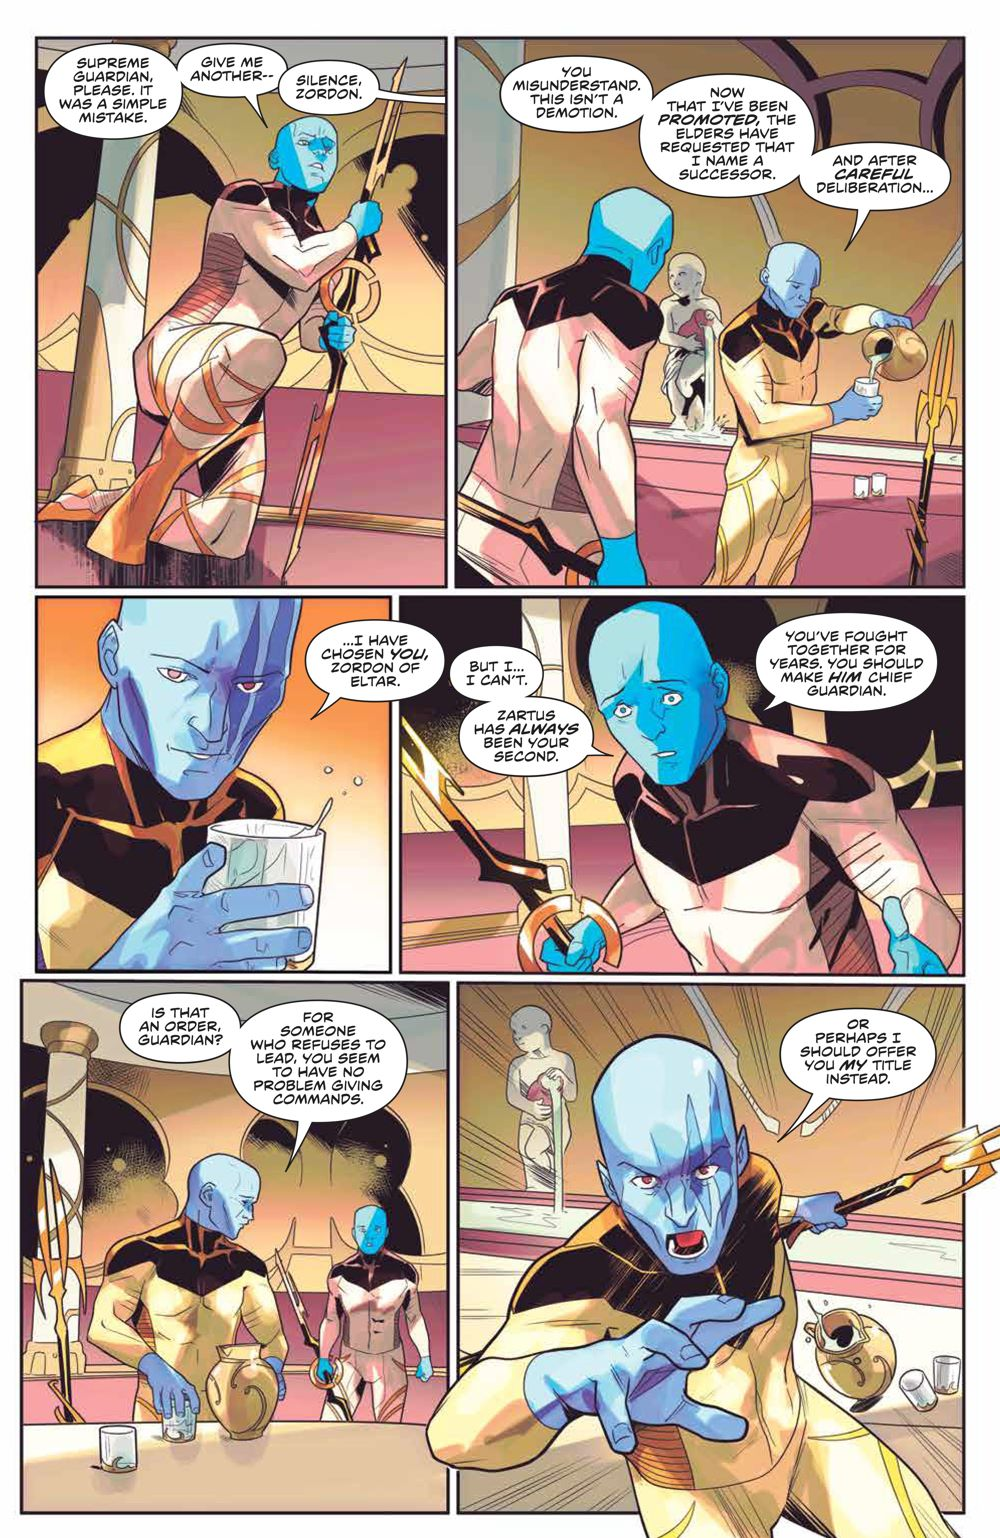 MightyMorphin_004_PRESS_4 ComicList Previews: MIGHTY MORPHIN #4